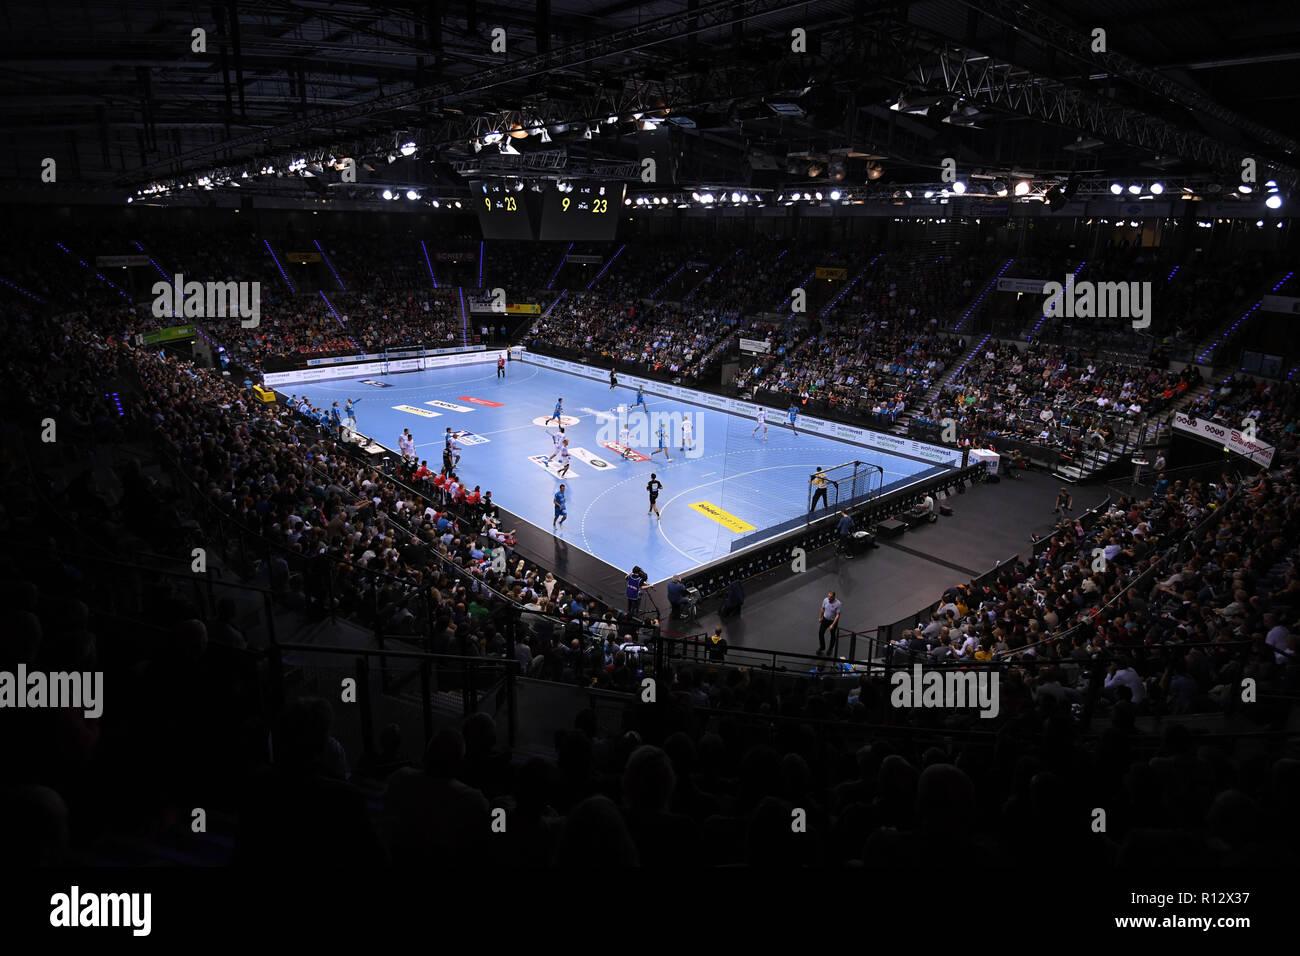 Stuttgart, Germany. 08th Nov, 2018. Handball: Bundesliga, TVB Stuttgart - SC Magdeburg, 12th matchday in the Porsche Arena. Hall overview. Credit: Marijan Murat/dpa/Alamy Live News - Stock Image